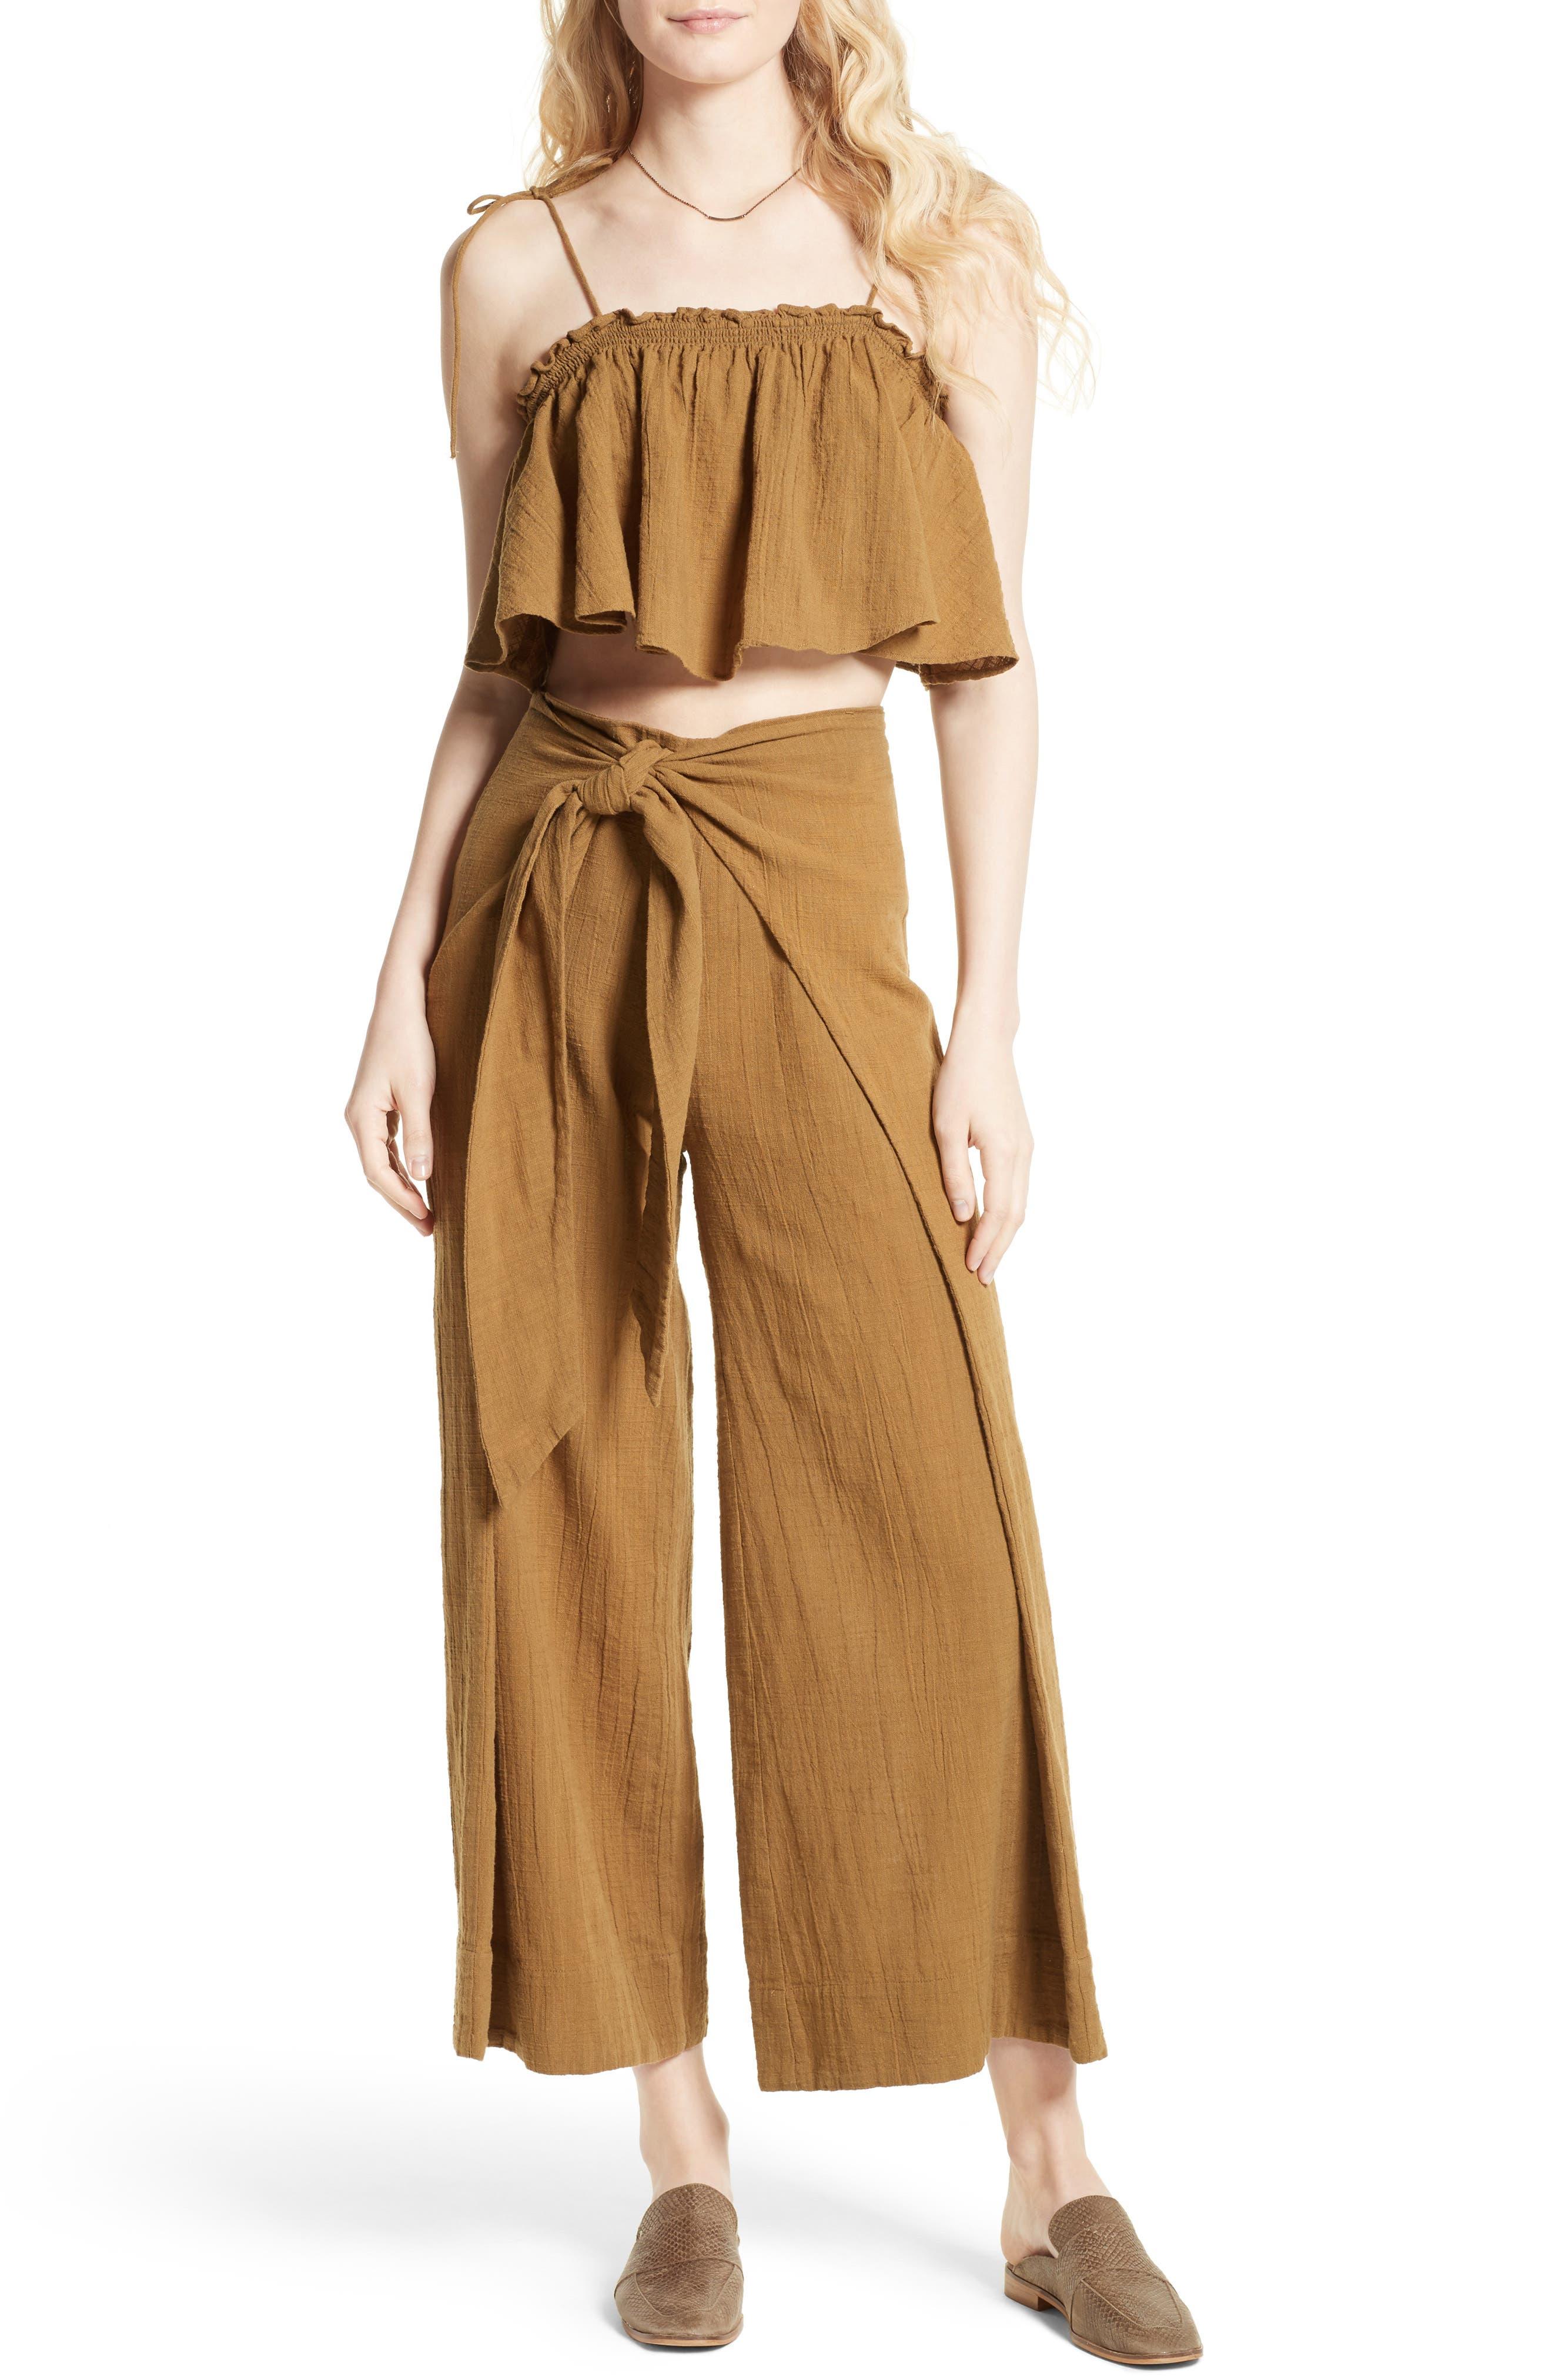 FREE PEOPLE Tropic Babe Crop Top & High Waist Pants Set, Main, color, 203